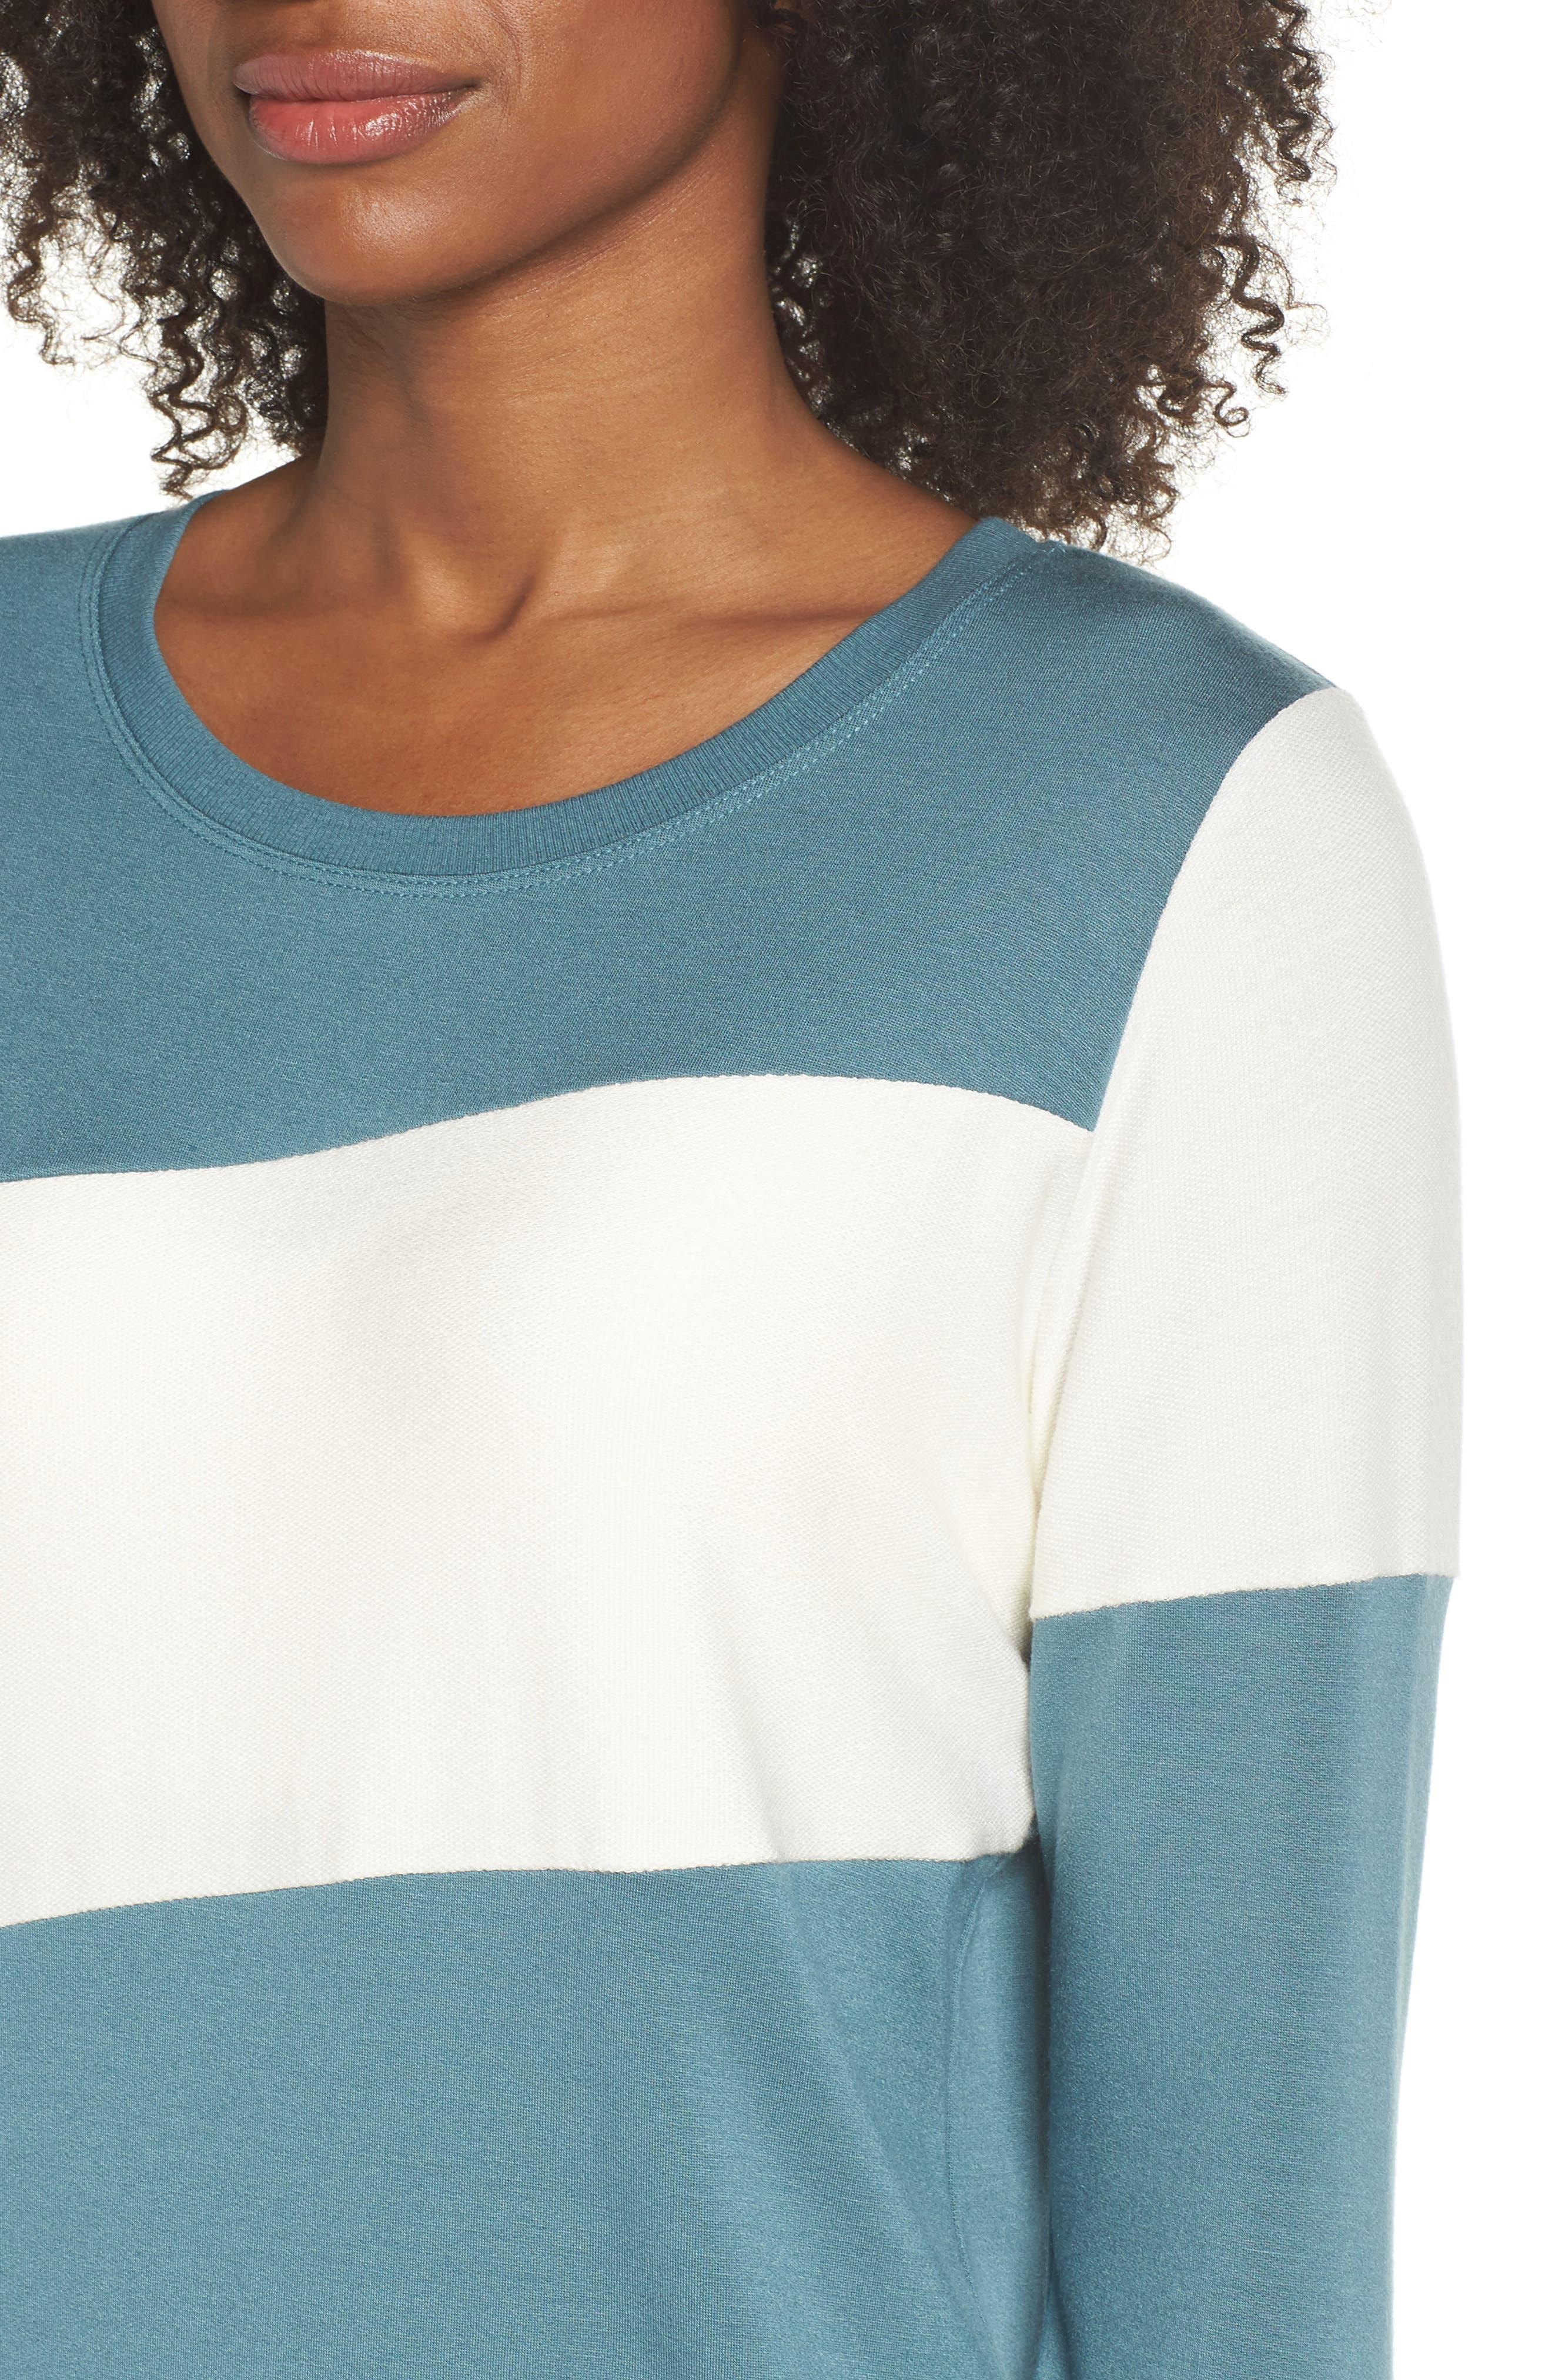 Ramp Sweatshirt,                             Alternate thumbnail 4, color,                             Blue Surf/ Off White